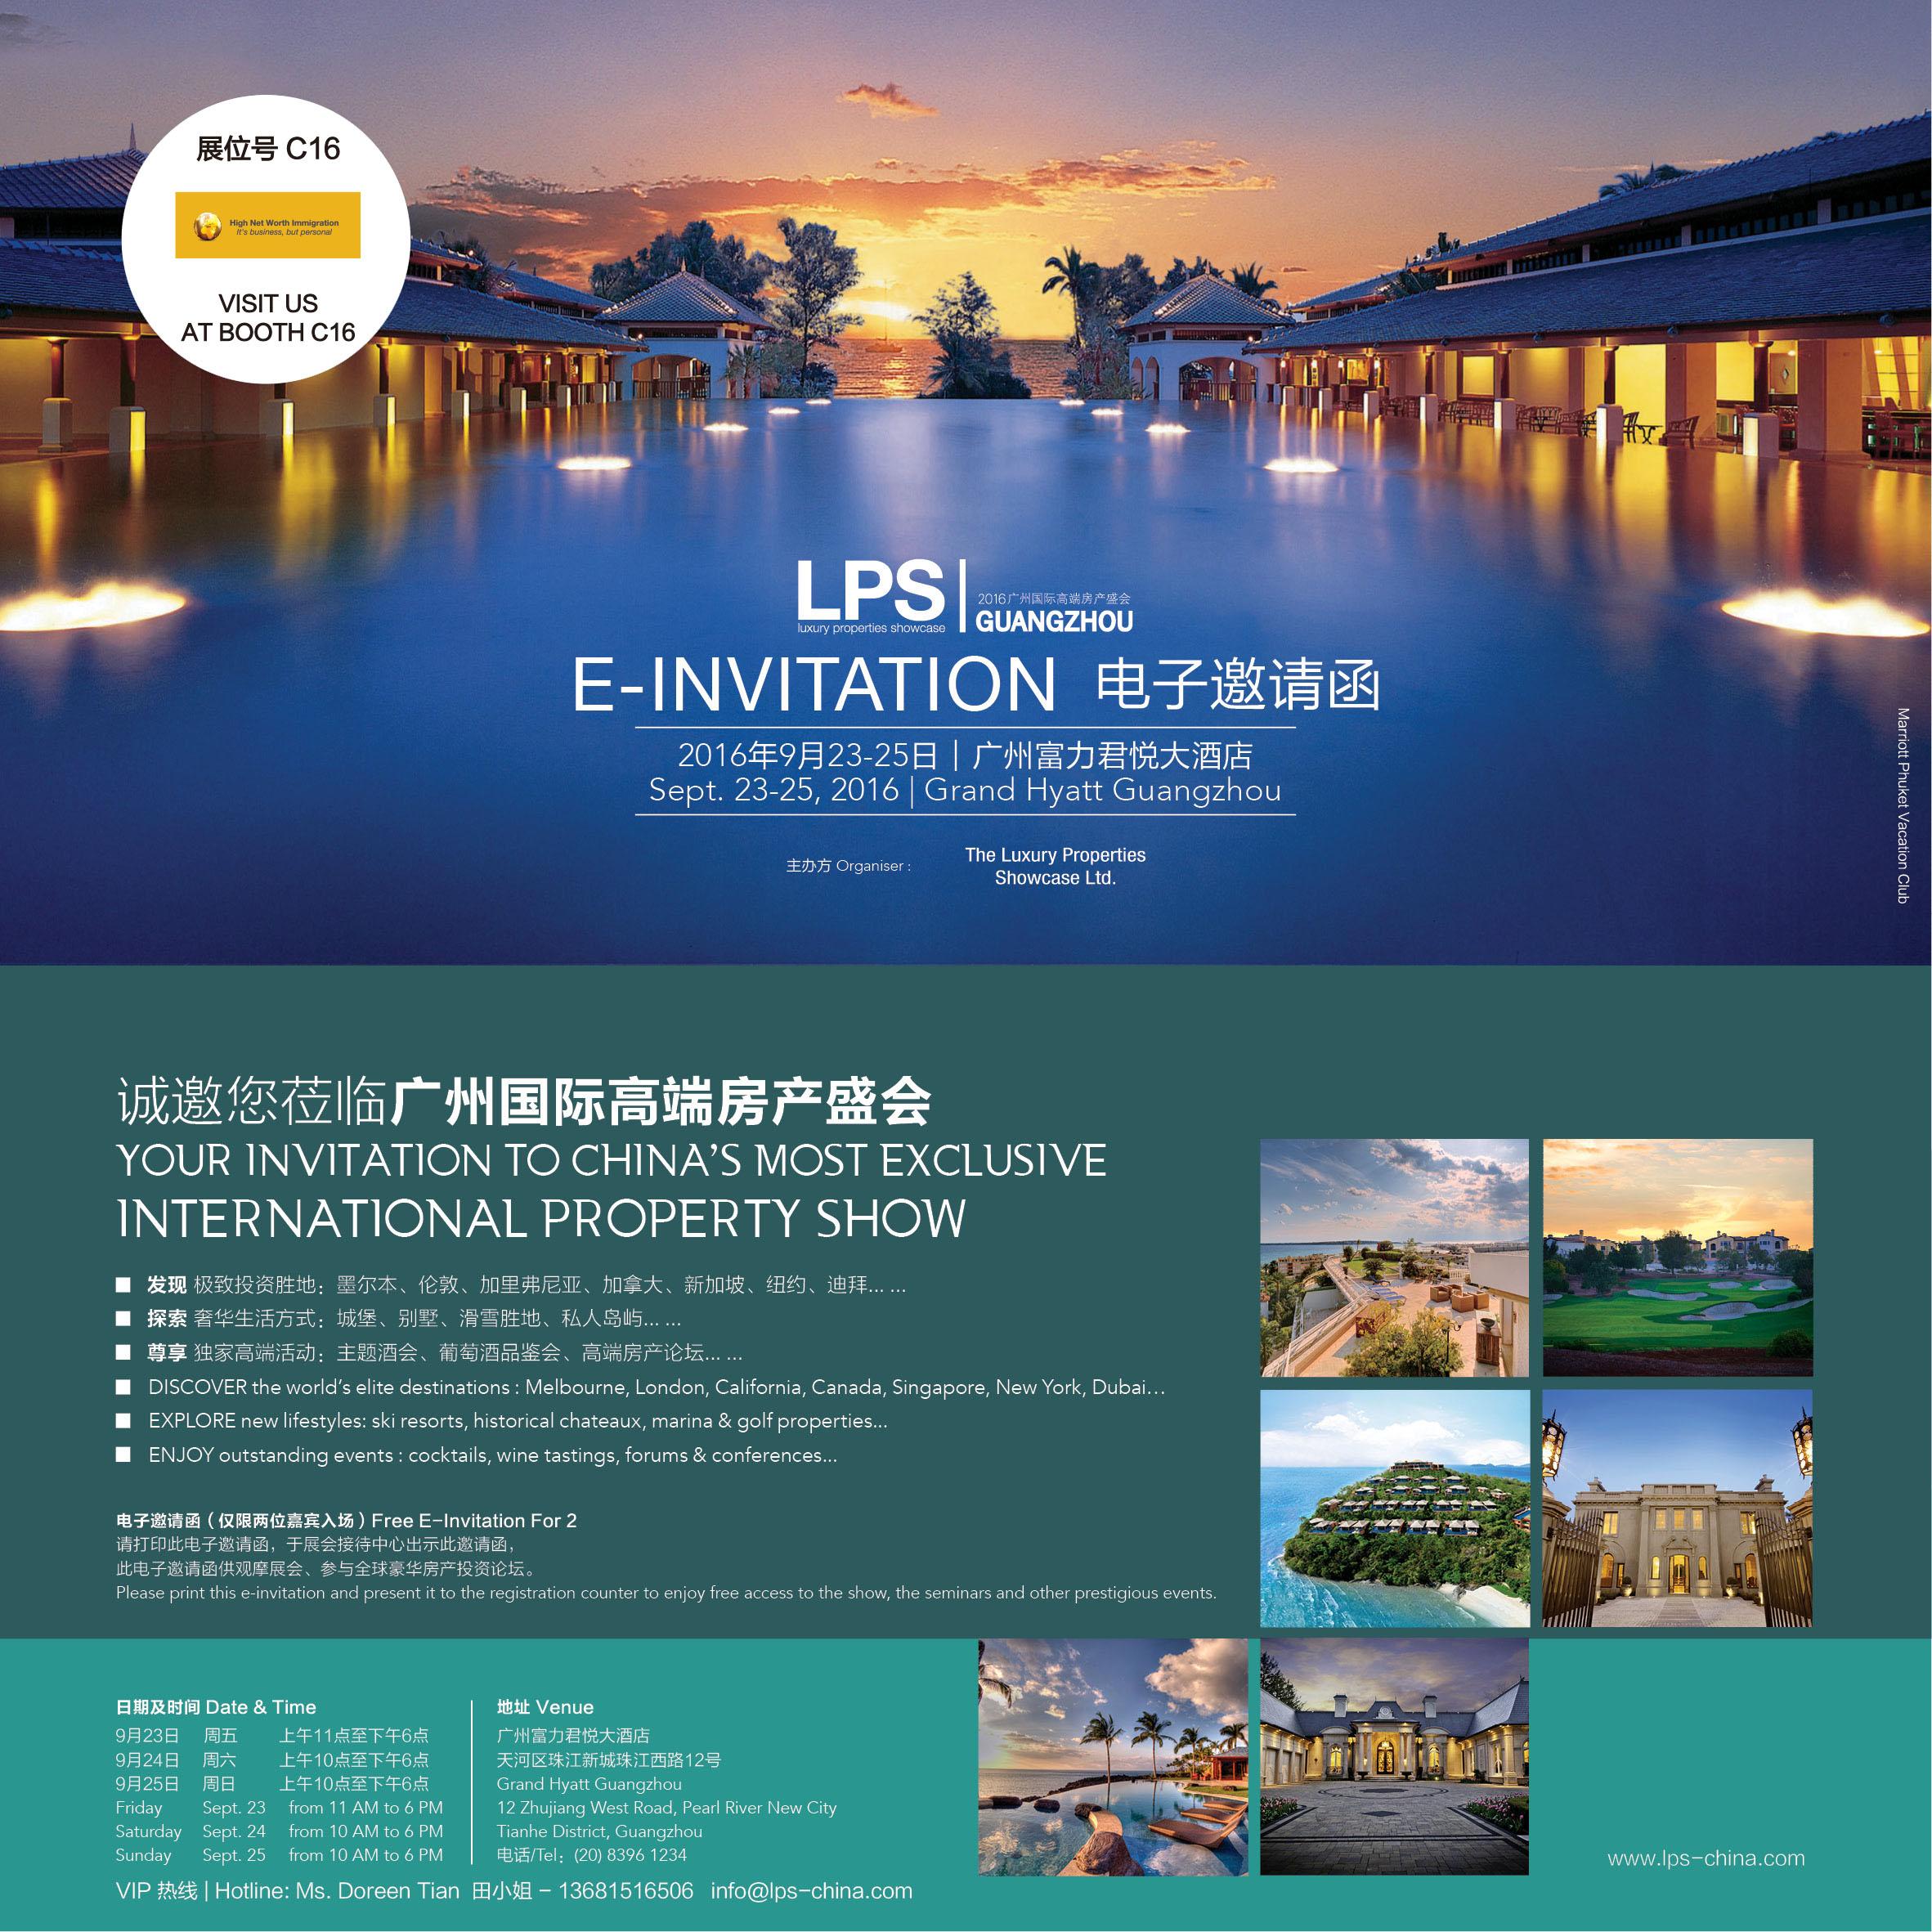 LPS_Guangzhou_2016_-_Invitation_-_Sept_23-25_-_C16.jpg